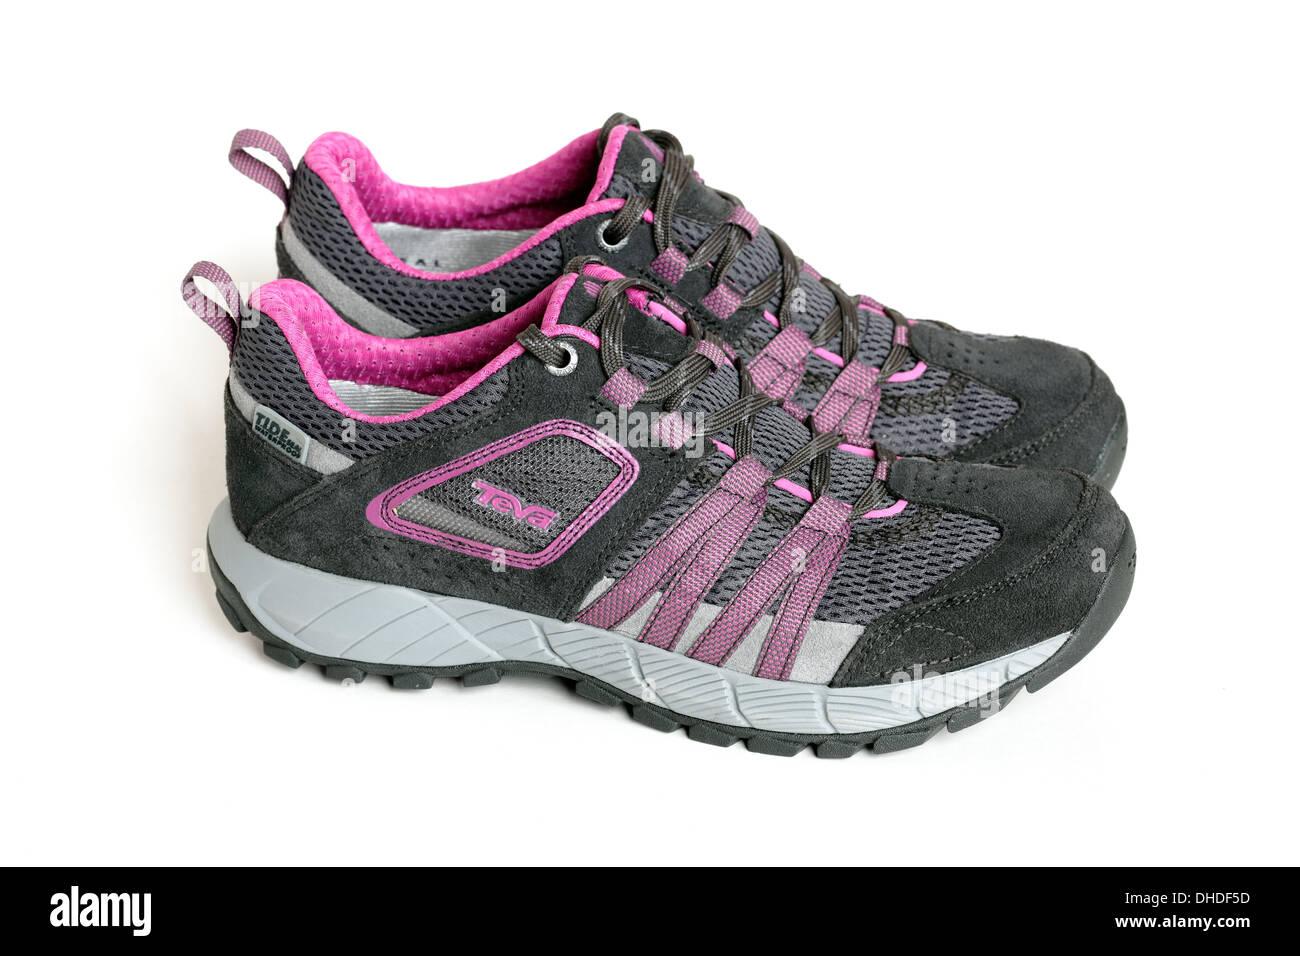 A new pair of Teva Wapta women's walking shoes, UK - Stock Image